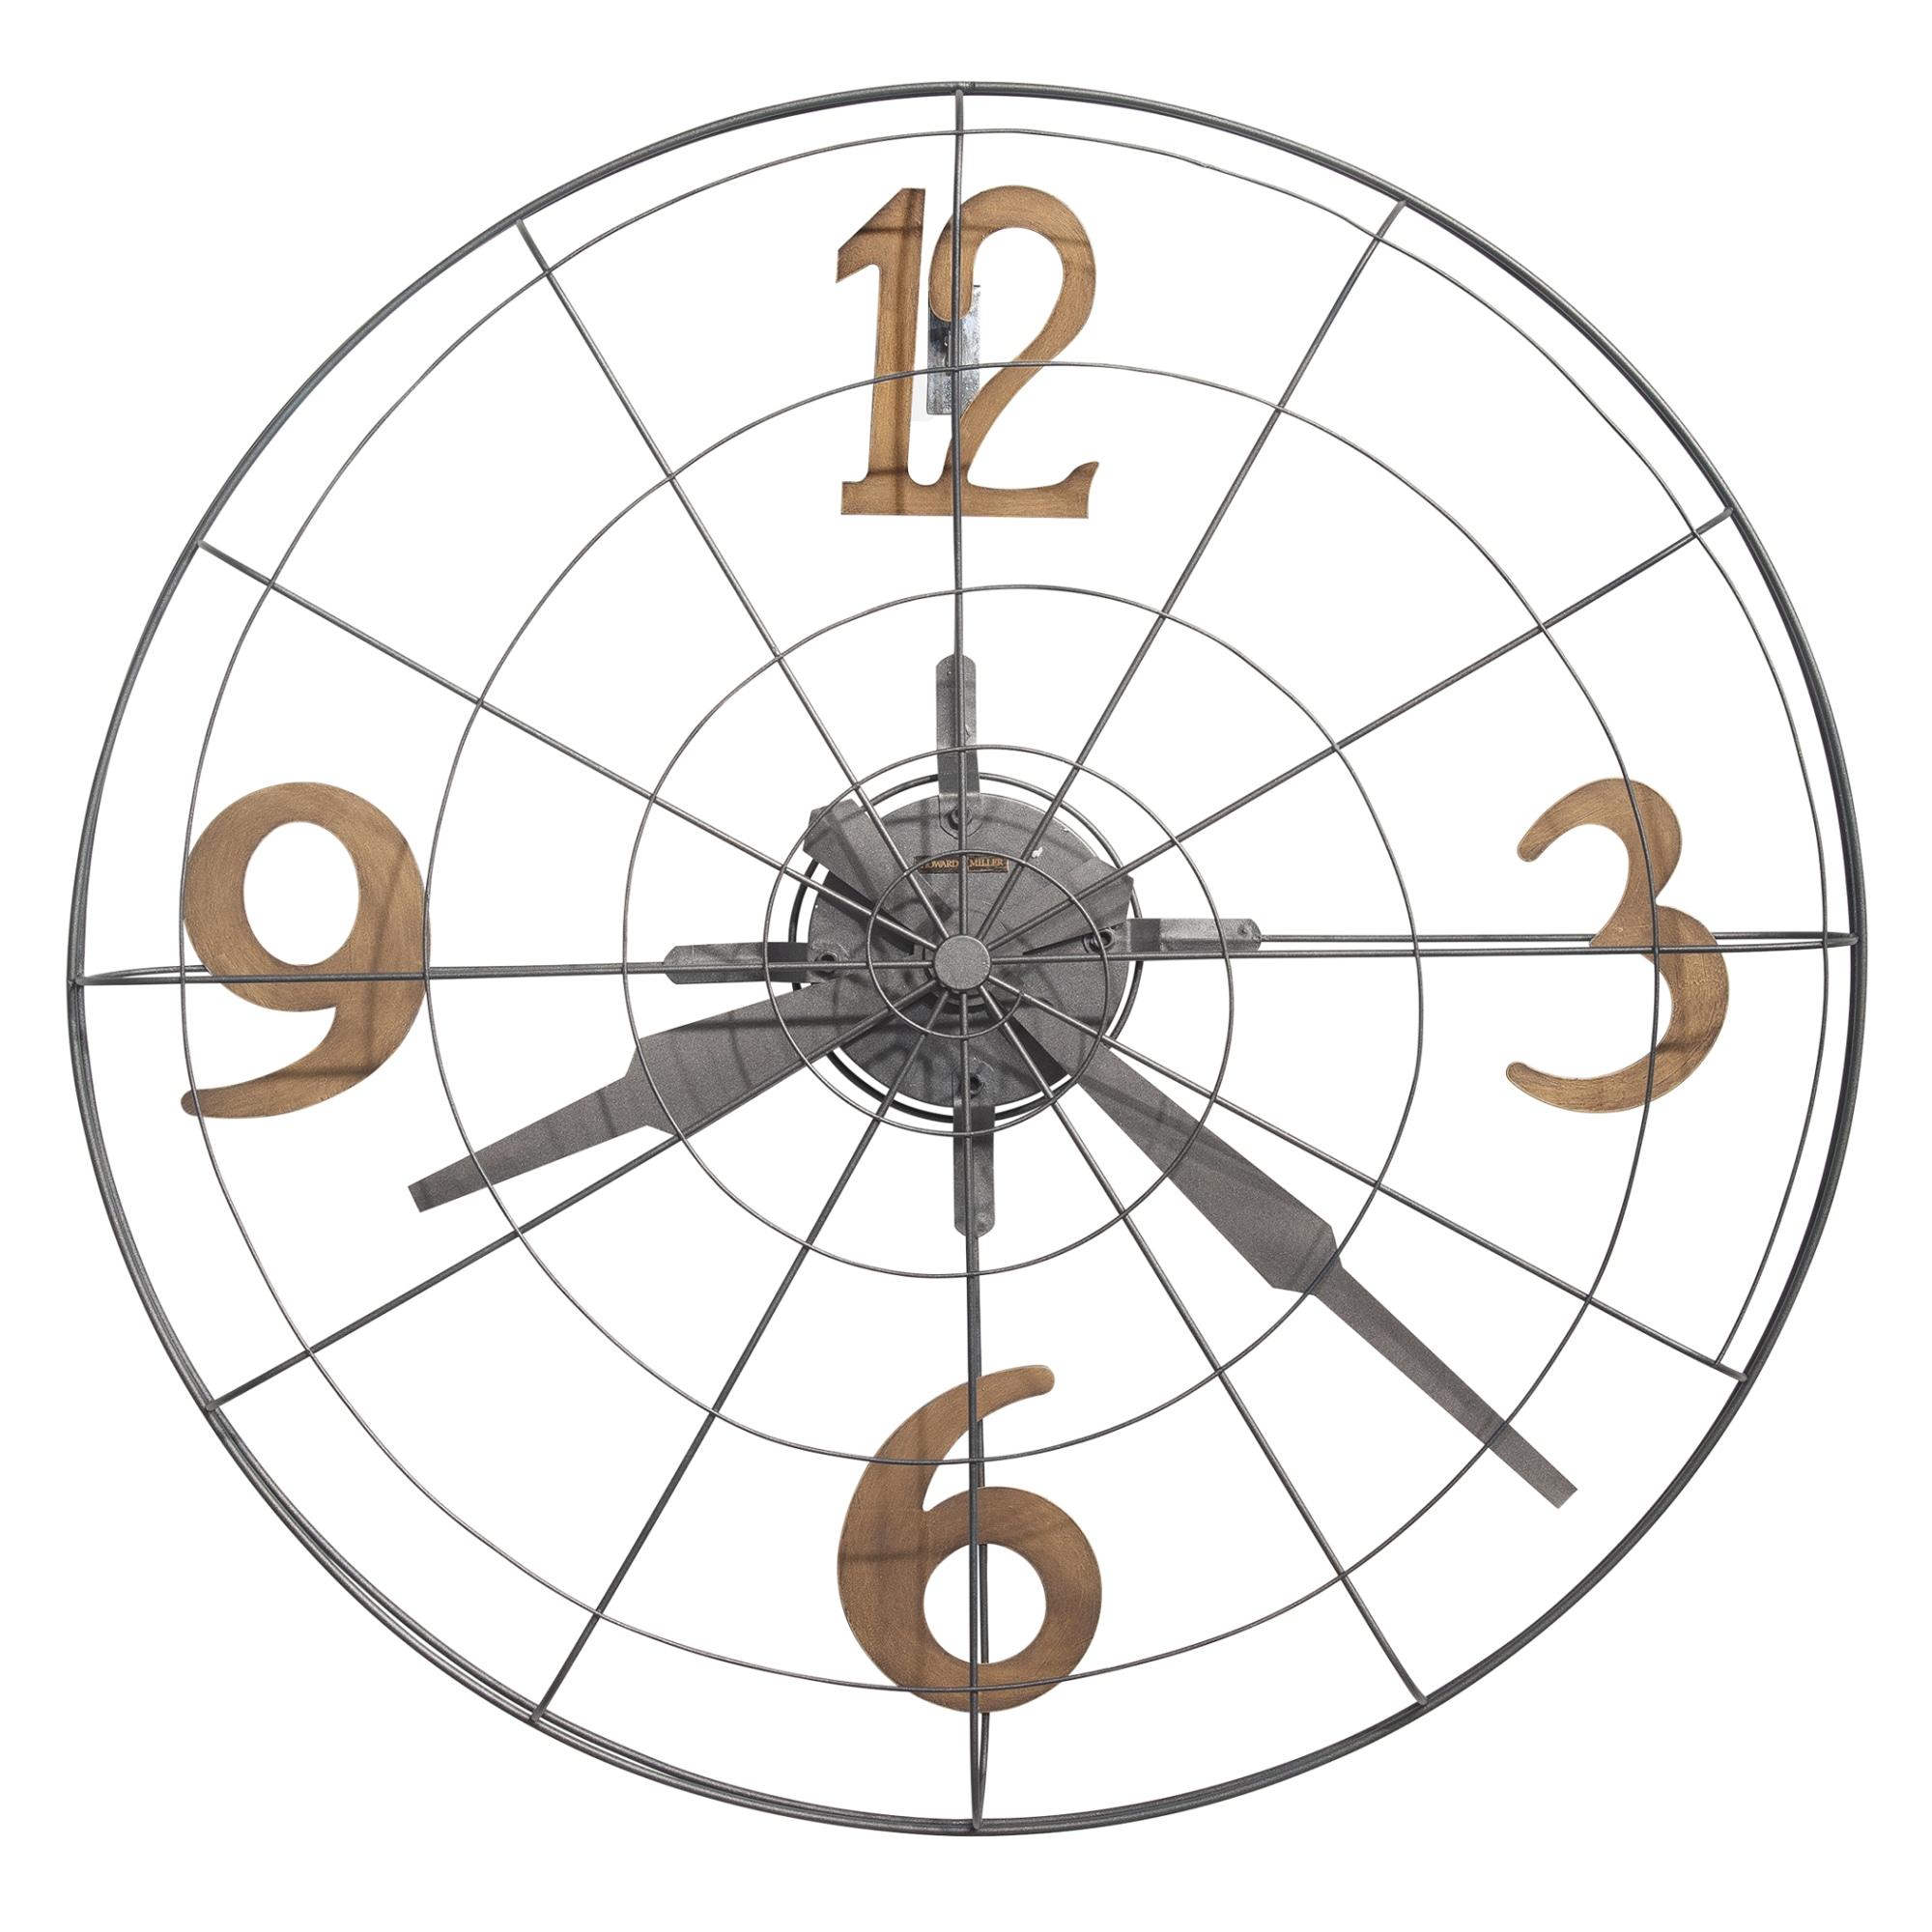 Image for Howard Miller Phan Metal Oversized Wall Clock 625635 from Howard Miller Official Website